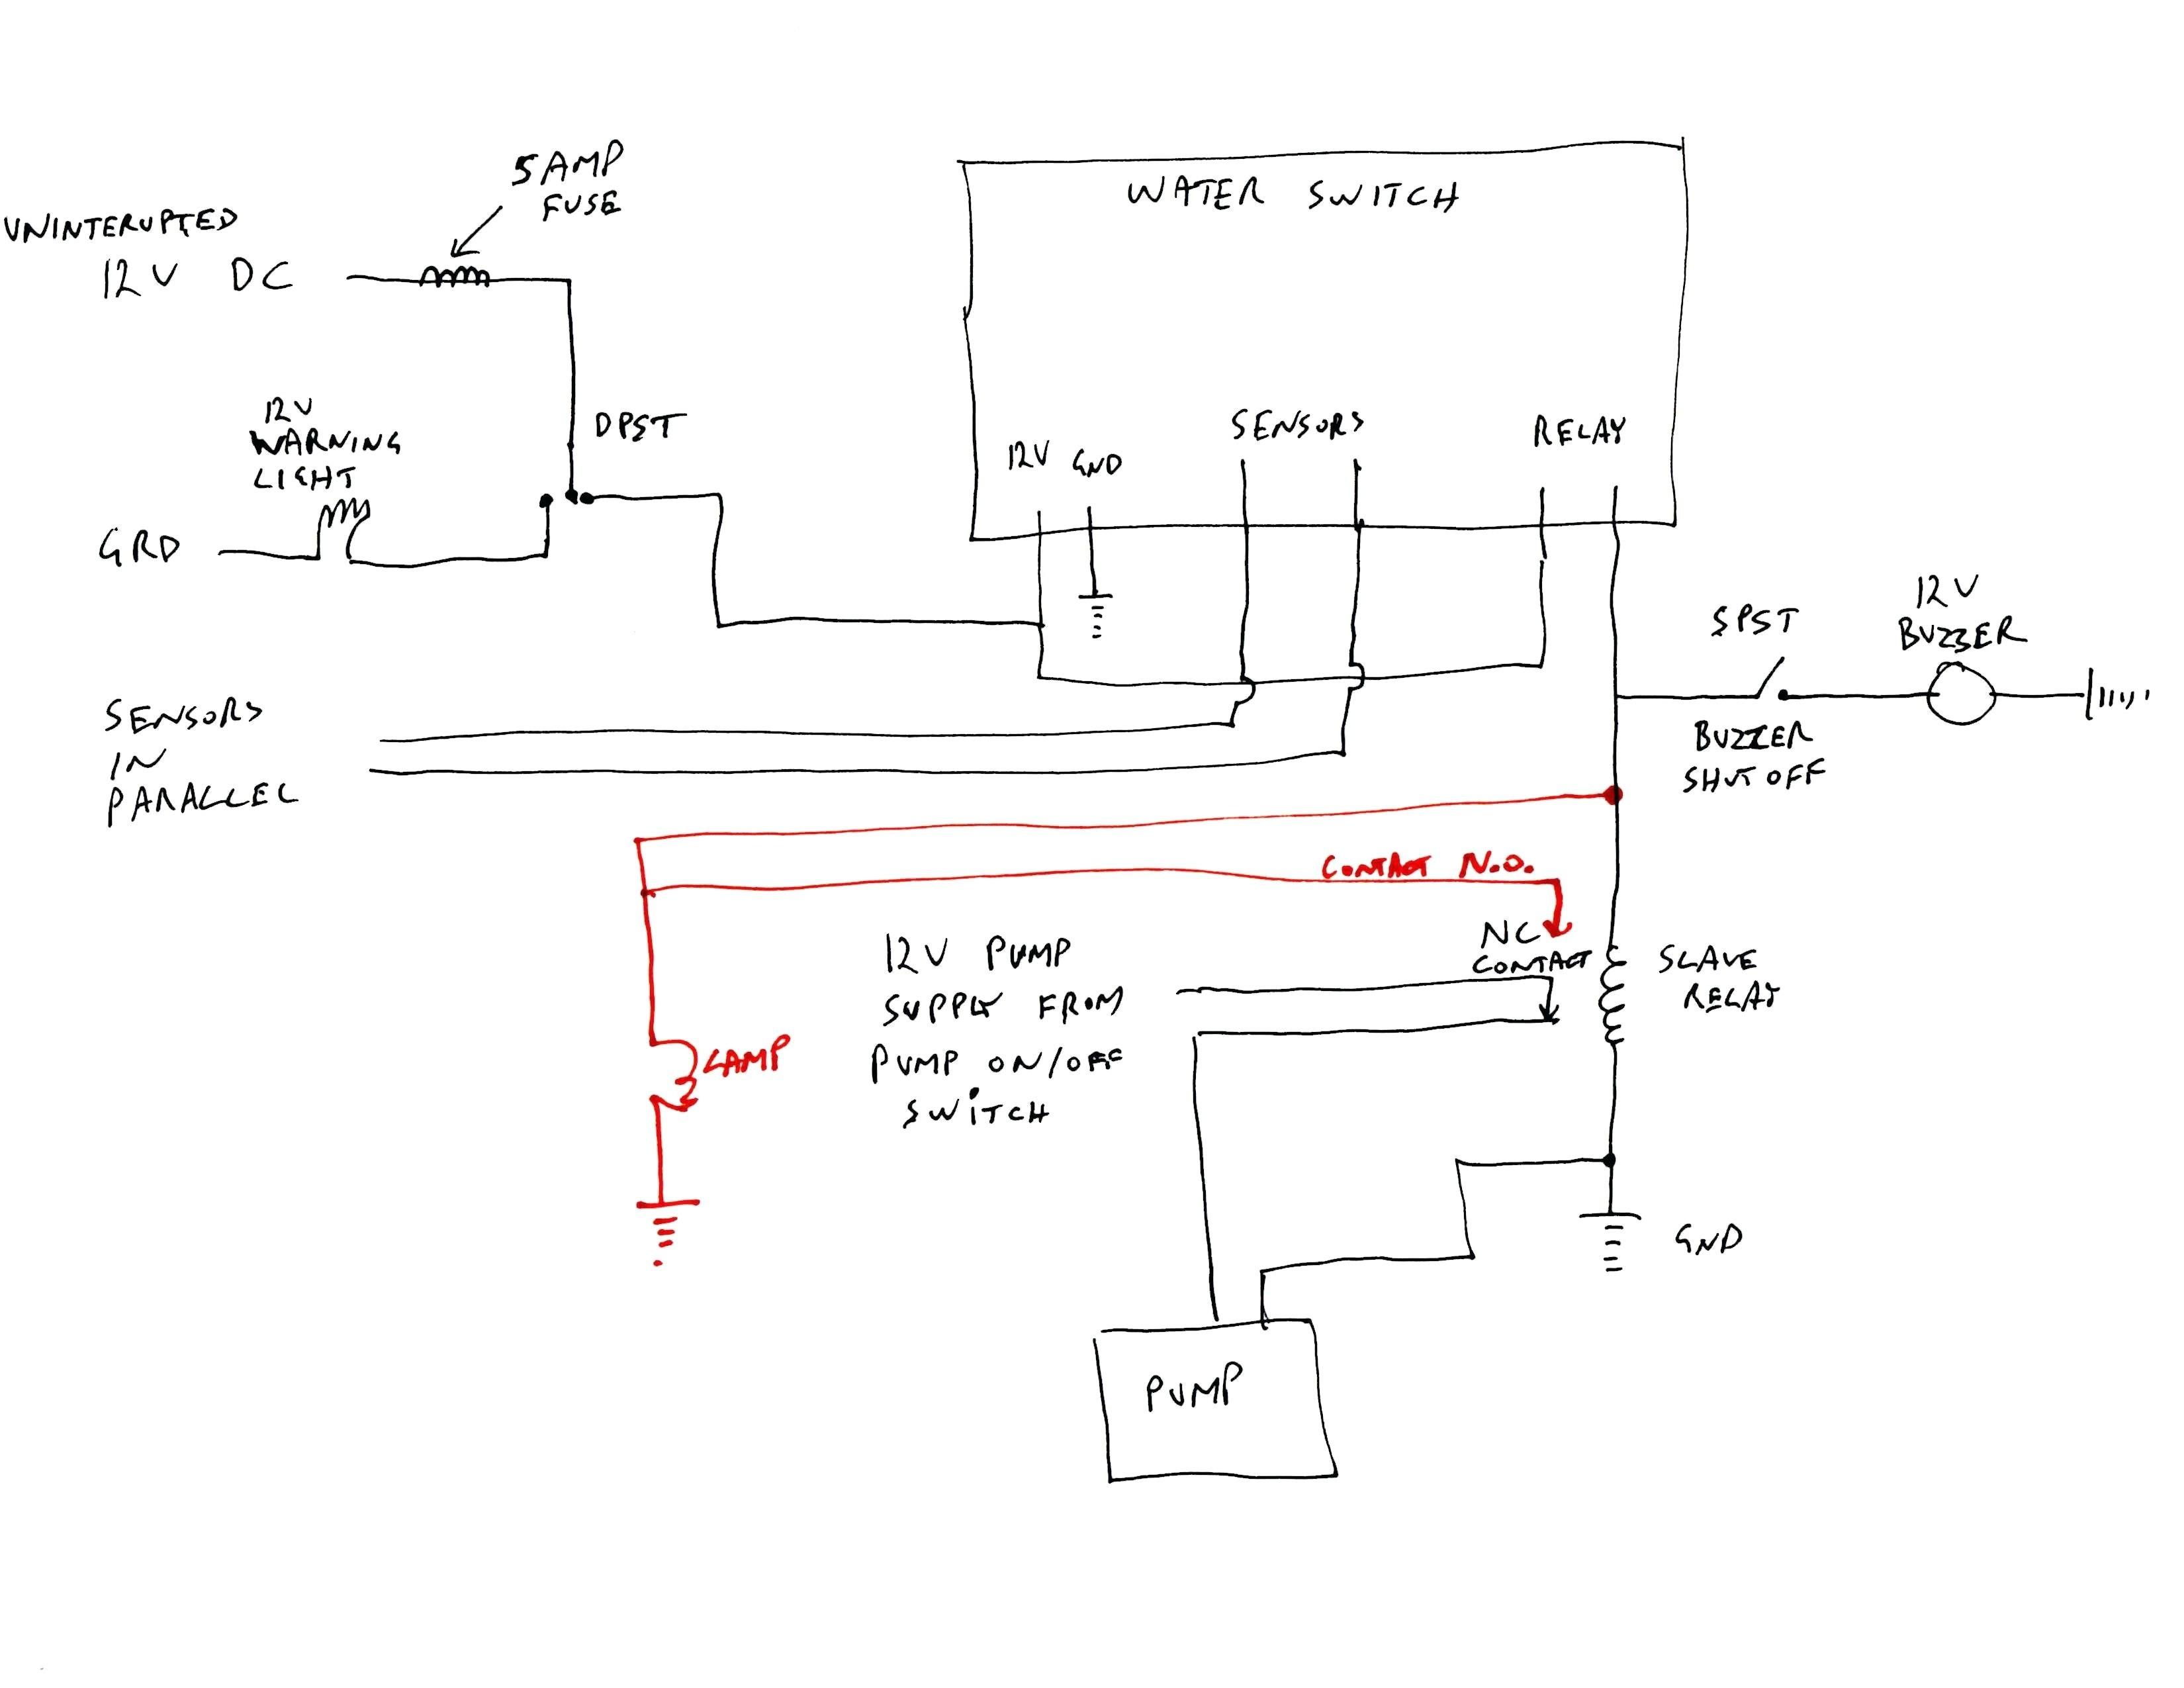 Camper Trailer 12 Volt Wiring Diagram Jayco Wiring Diagrams Wiring Diagram Database Of Camper Trailer 12 Volt Wiring Diagram